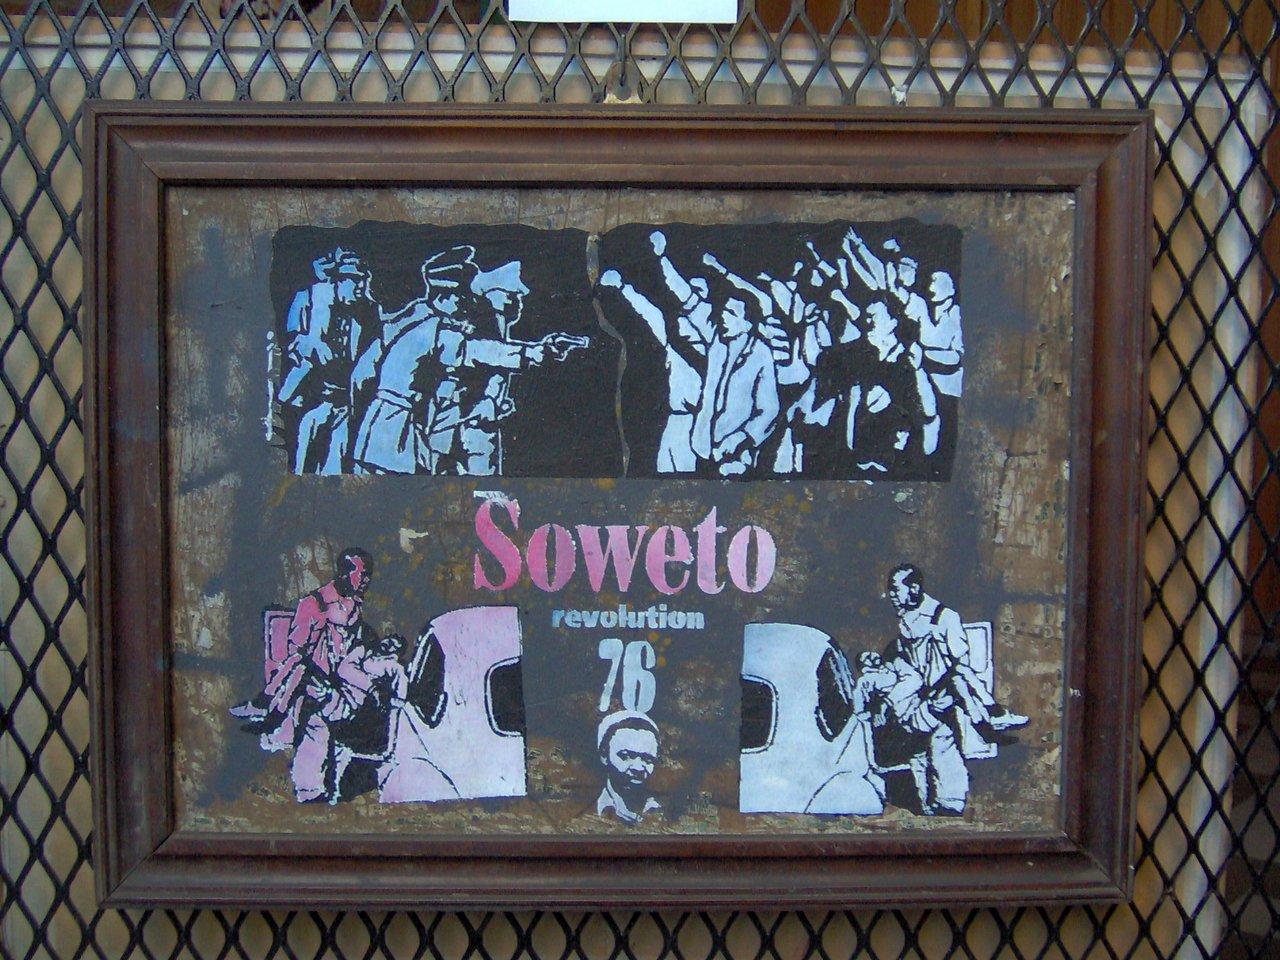 sudafrica itinerario: Soweto